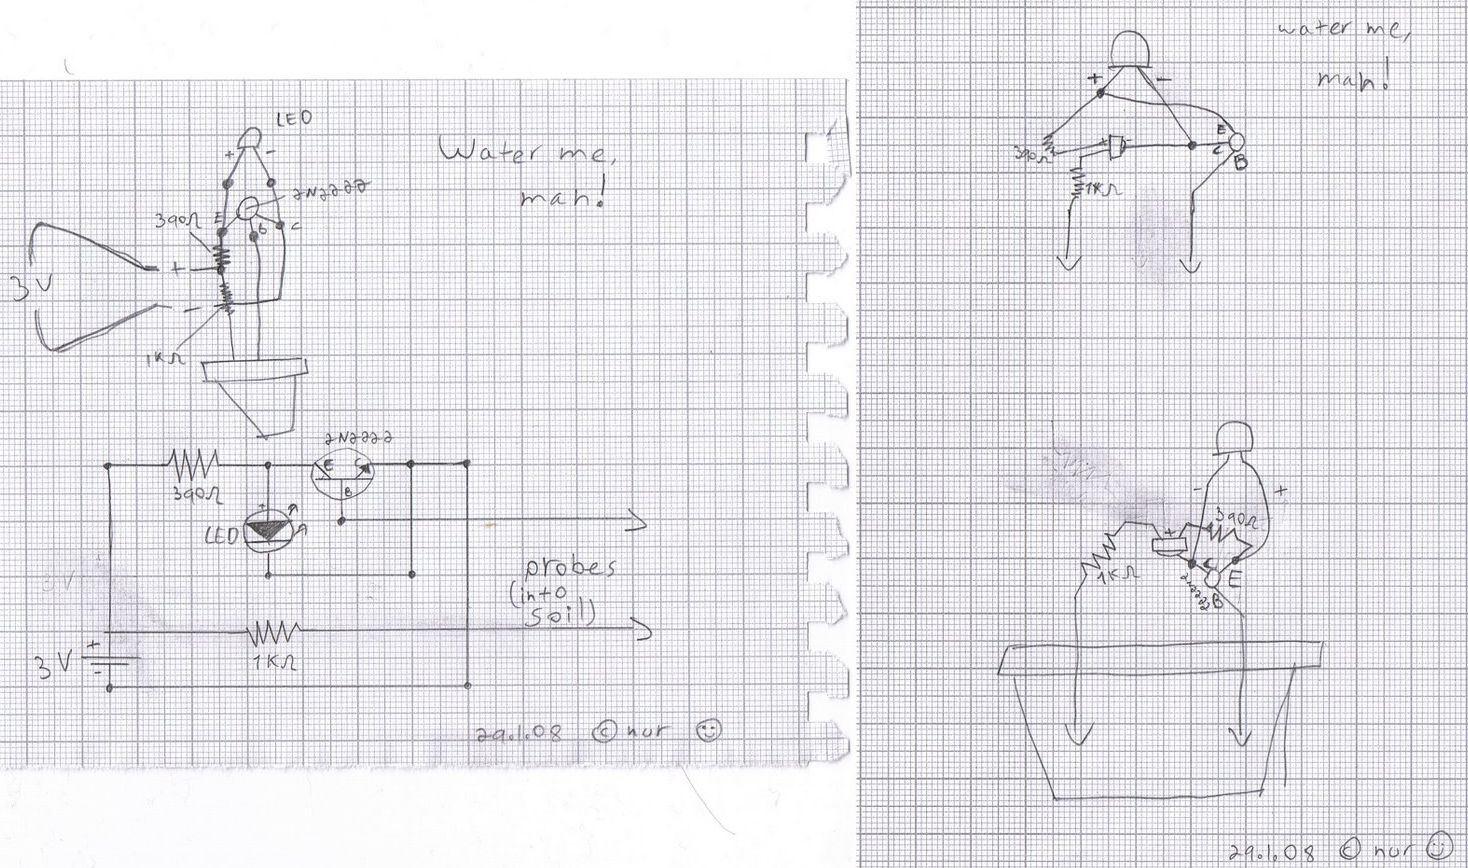 Simple Flower Watering Alarm Led Indicator Electronics Projects Electronic Stethescope Amplifier Circuit Homemade Saksi Cicek Sulama Elektronik Devre Semasi Water Man 120x120